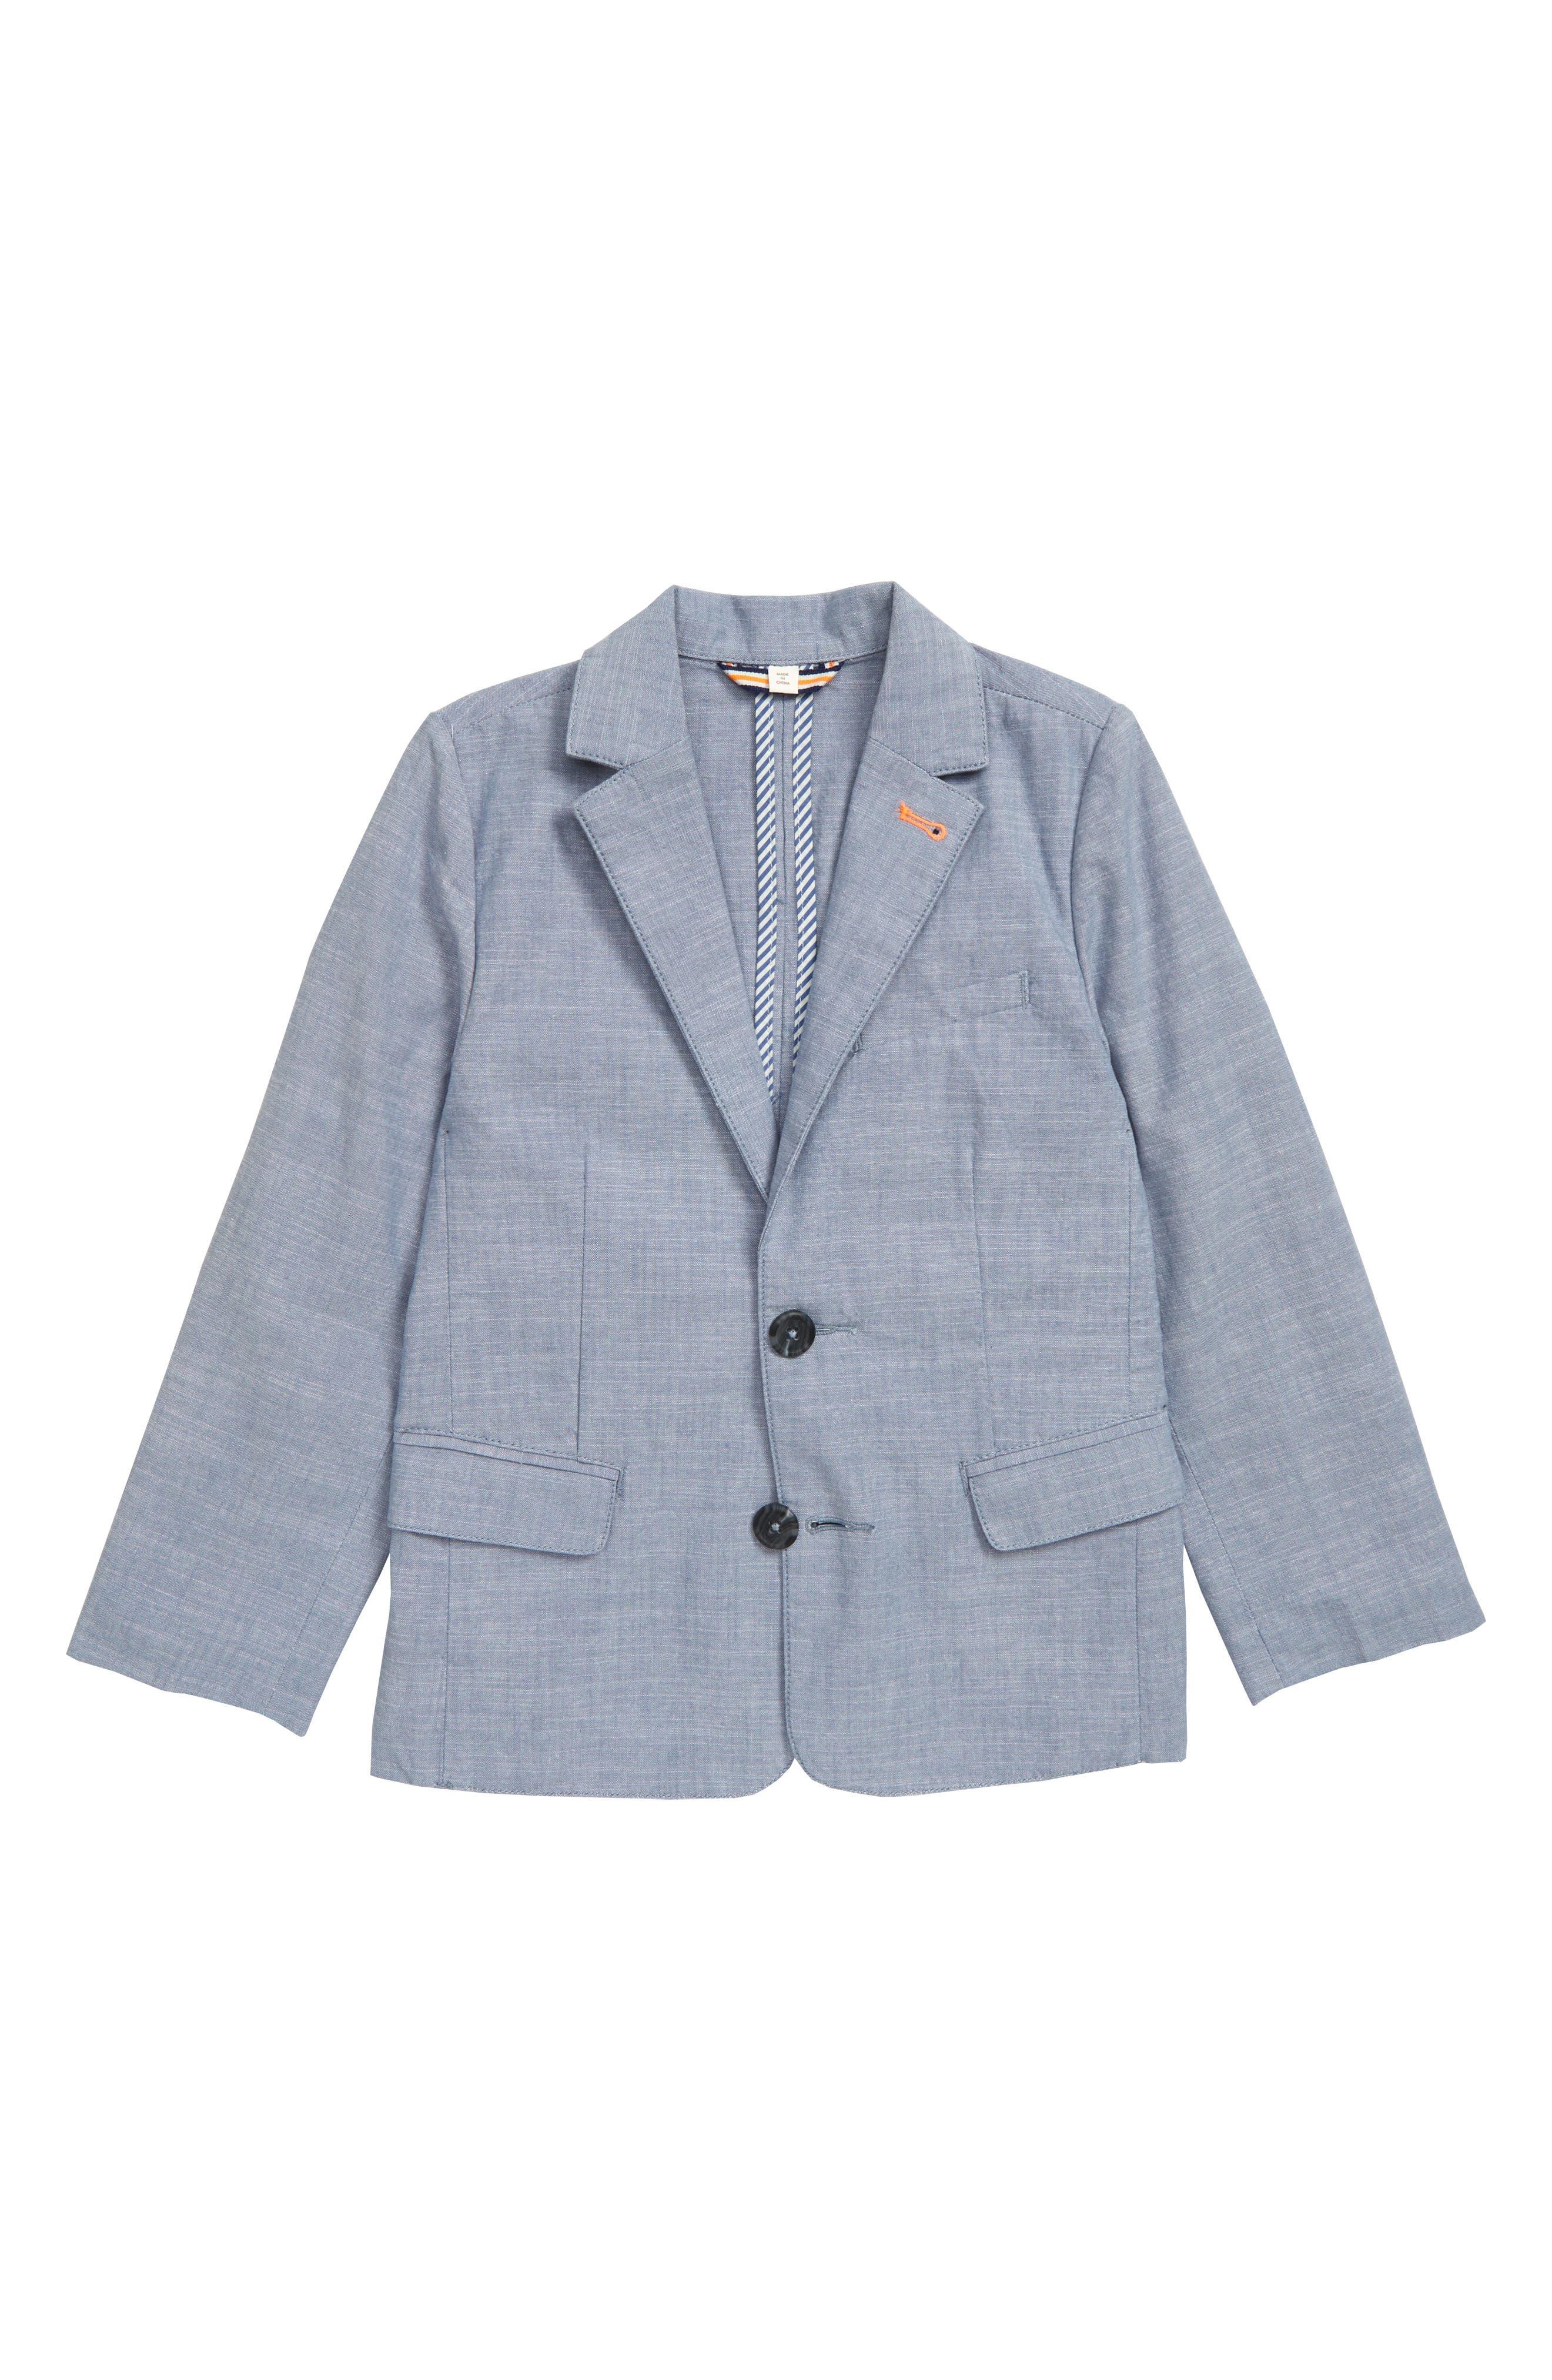 Boys Mini Boden Lightweight Blazer Size 910Y  Blue